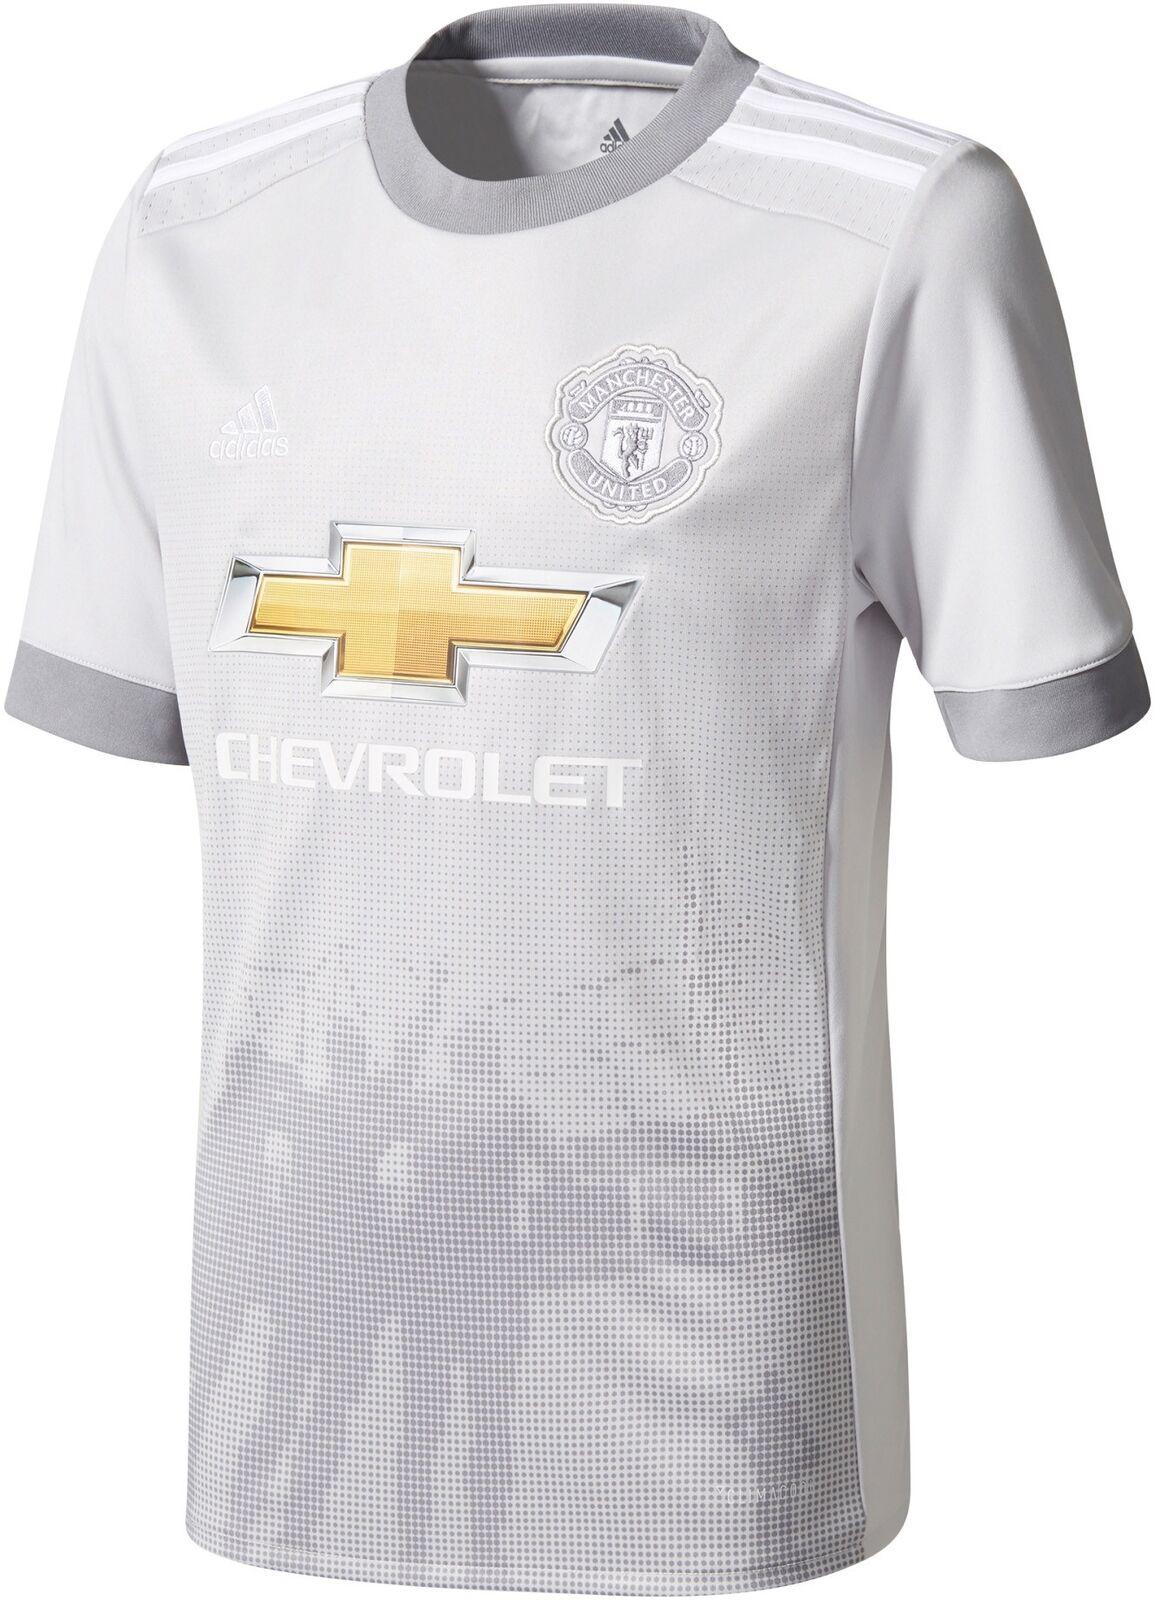 f91ef5ca1 adidas Manchester United 17 18 Third Shirt Medium 21 Ander Herrera ...